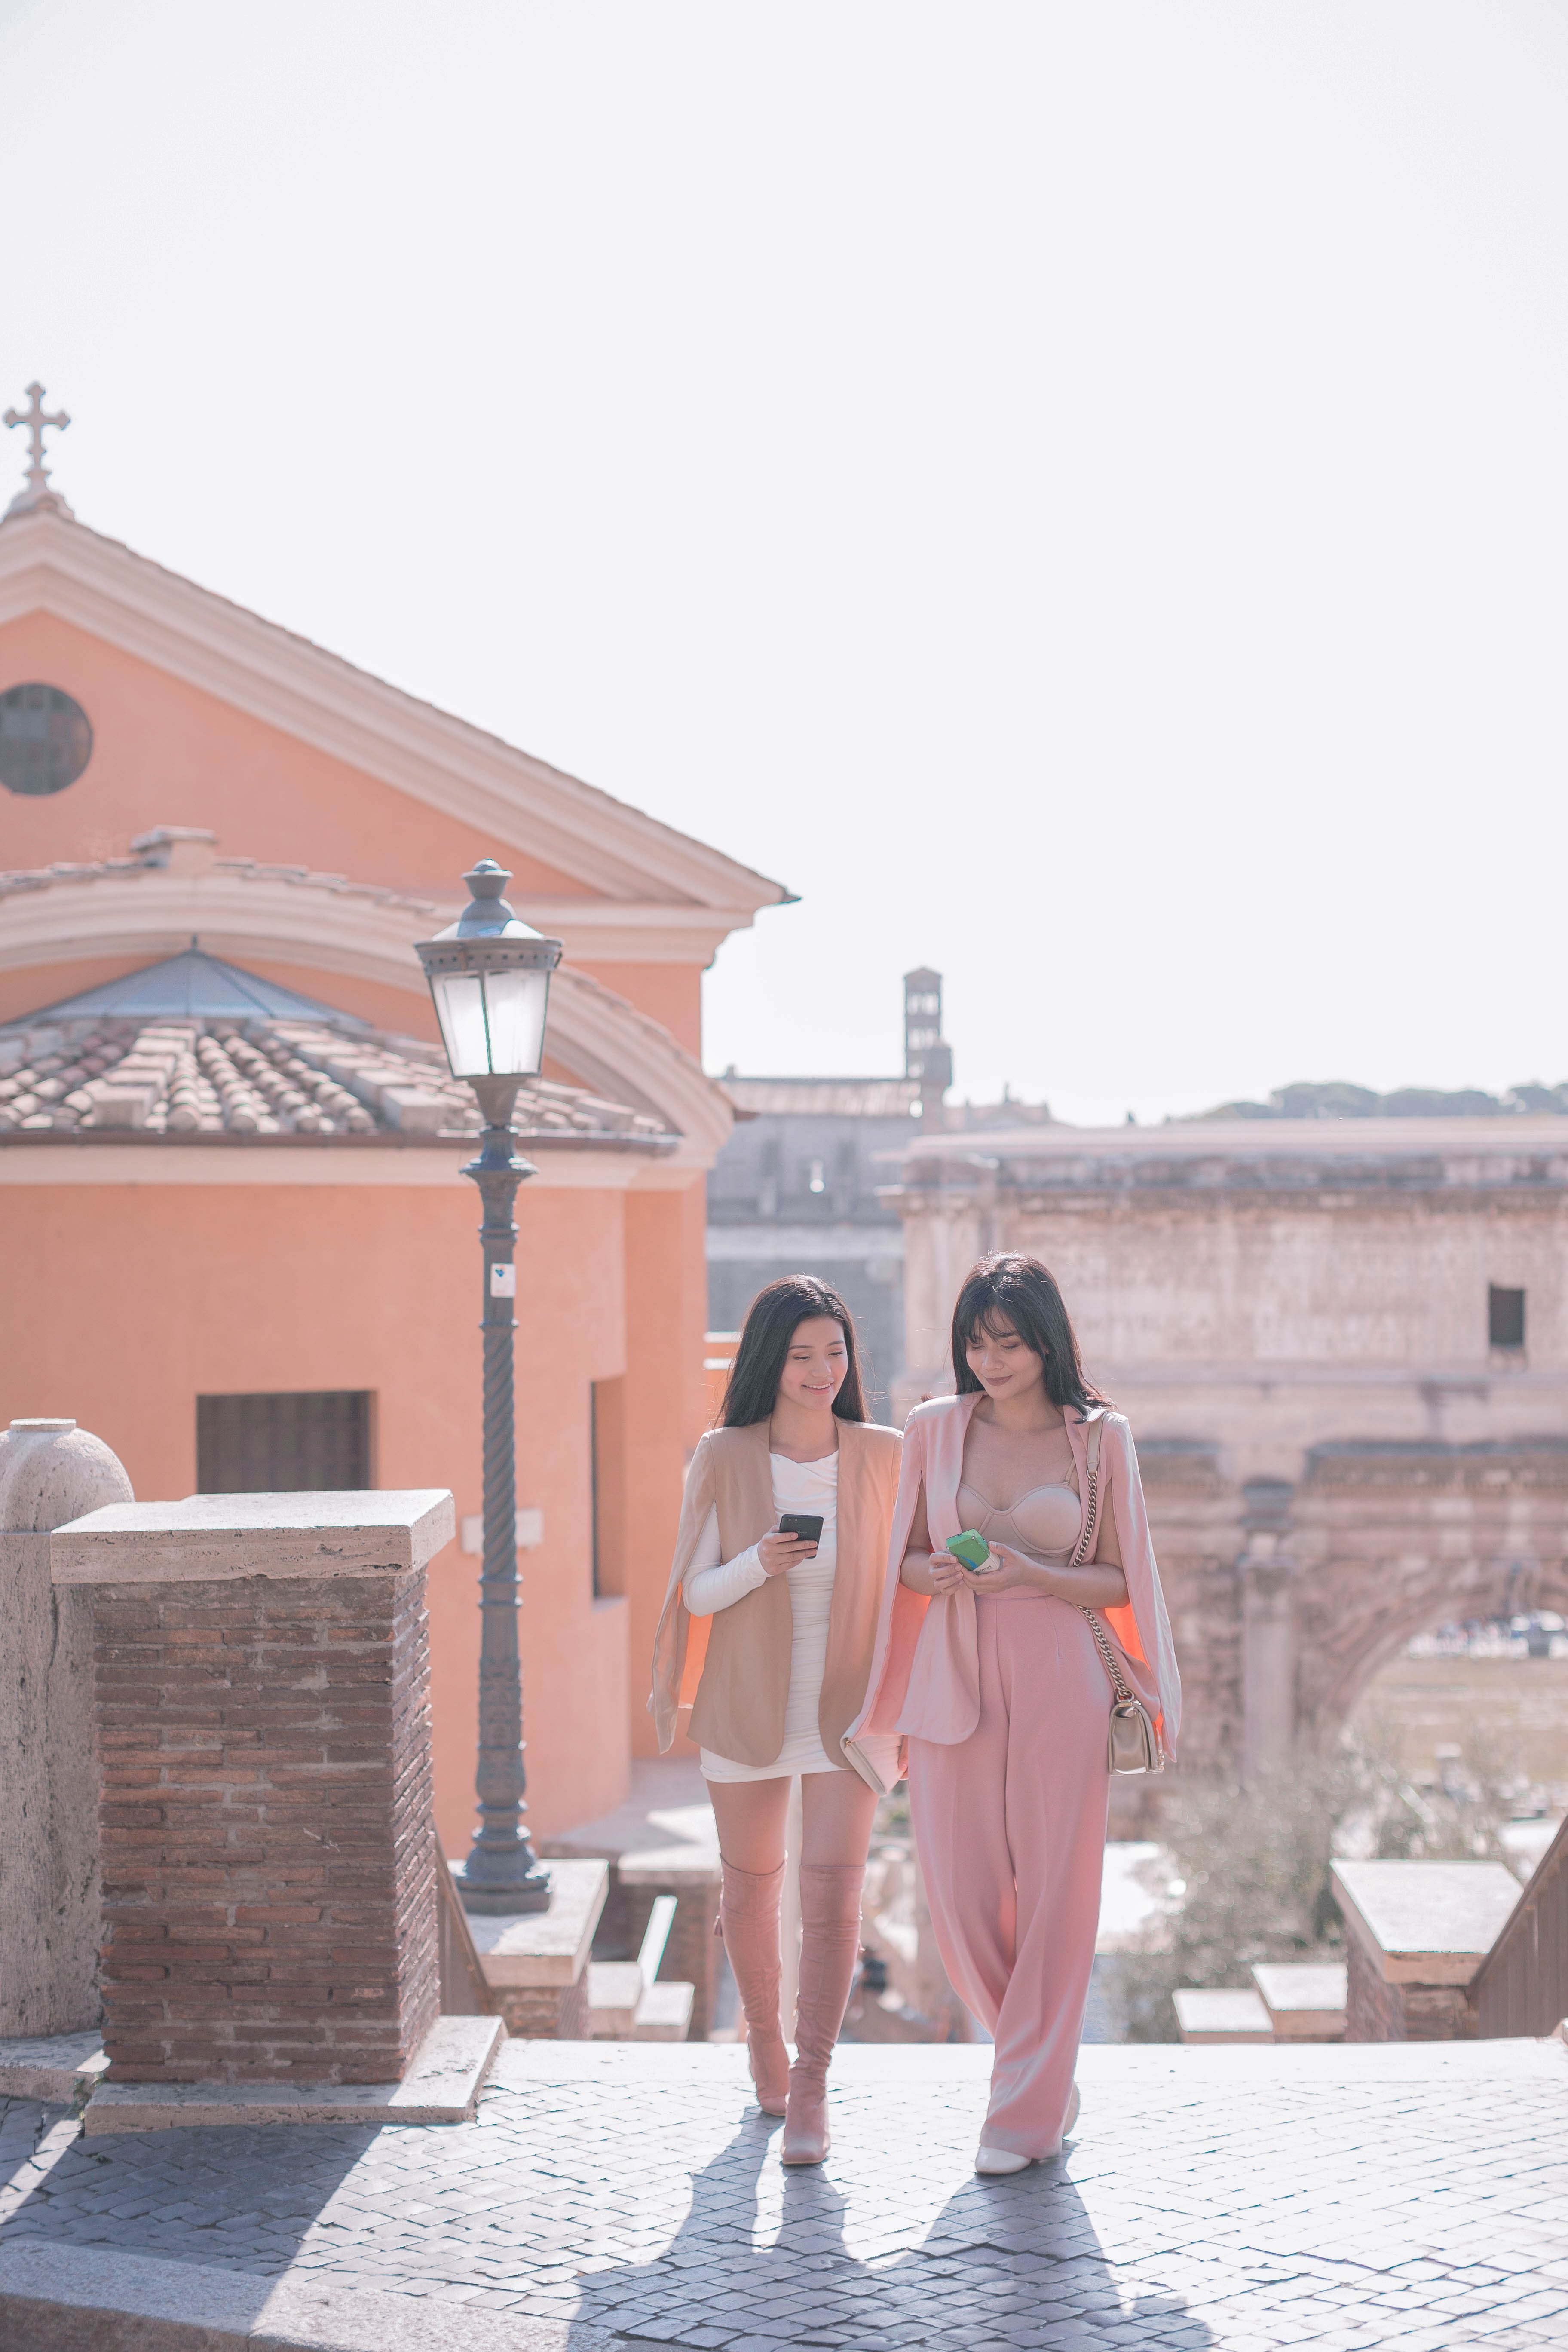 vernica_enciso-rome-s1_70 copy